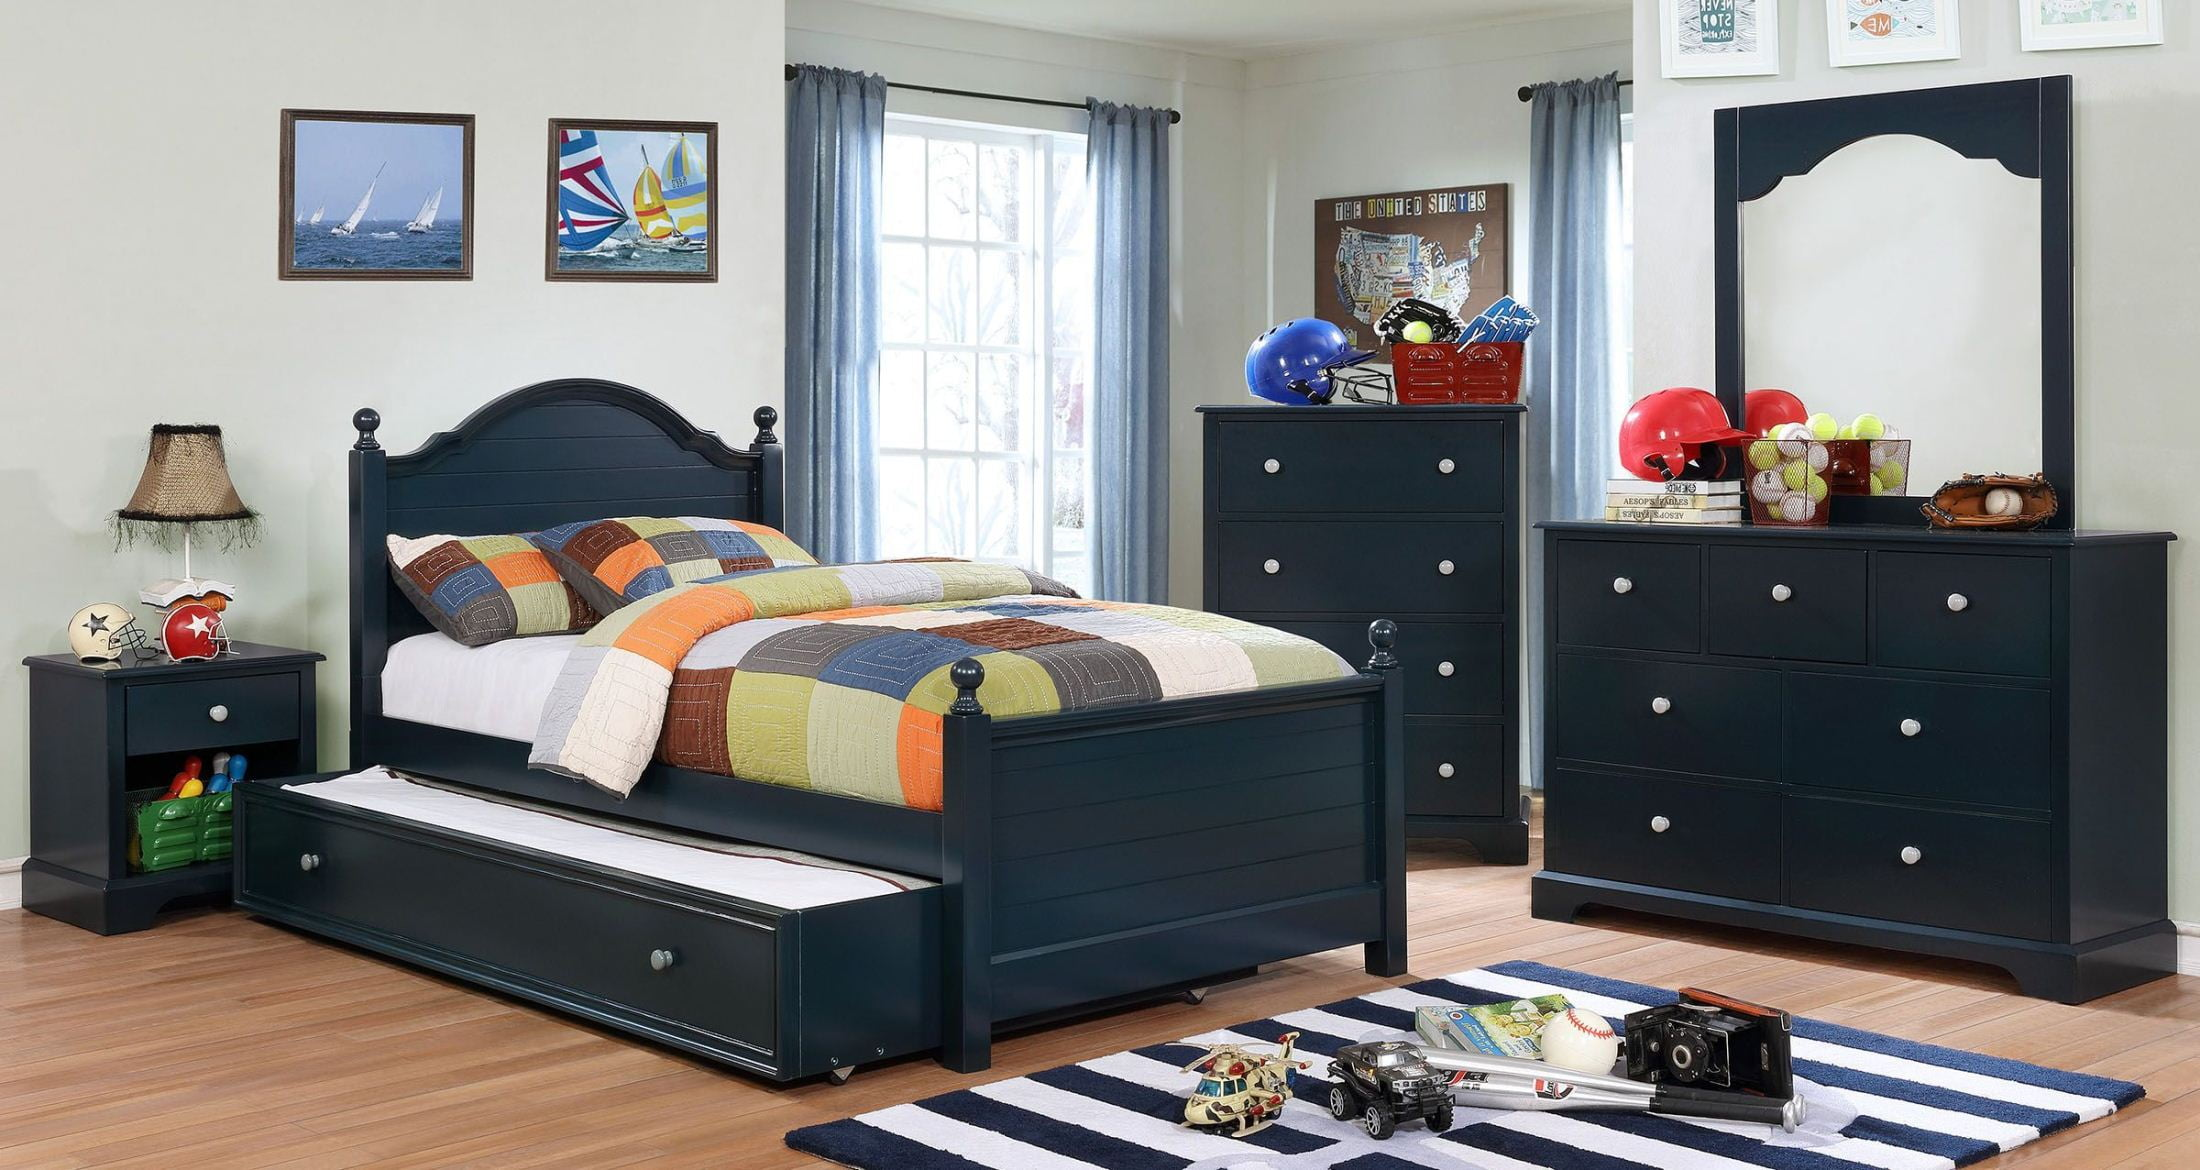 Furniture of america diane blue youth storage platform - Youth bedroom furniture with storage ...